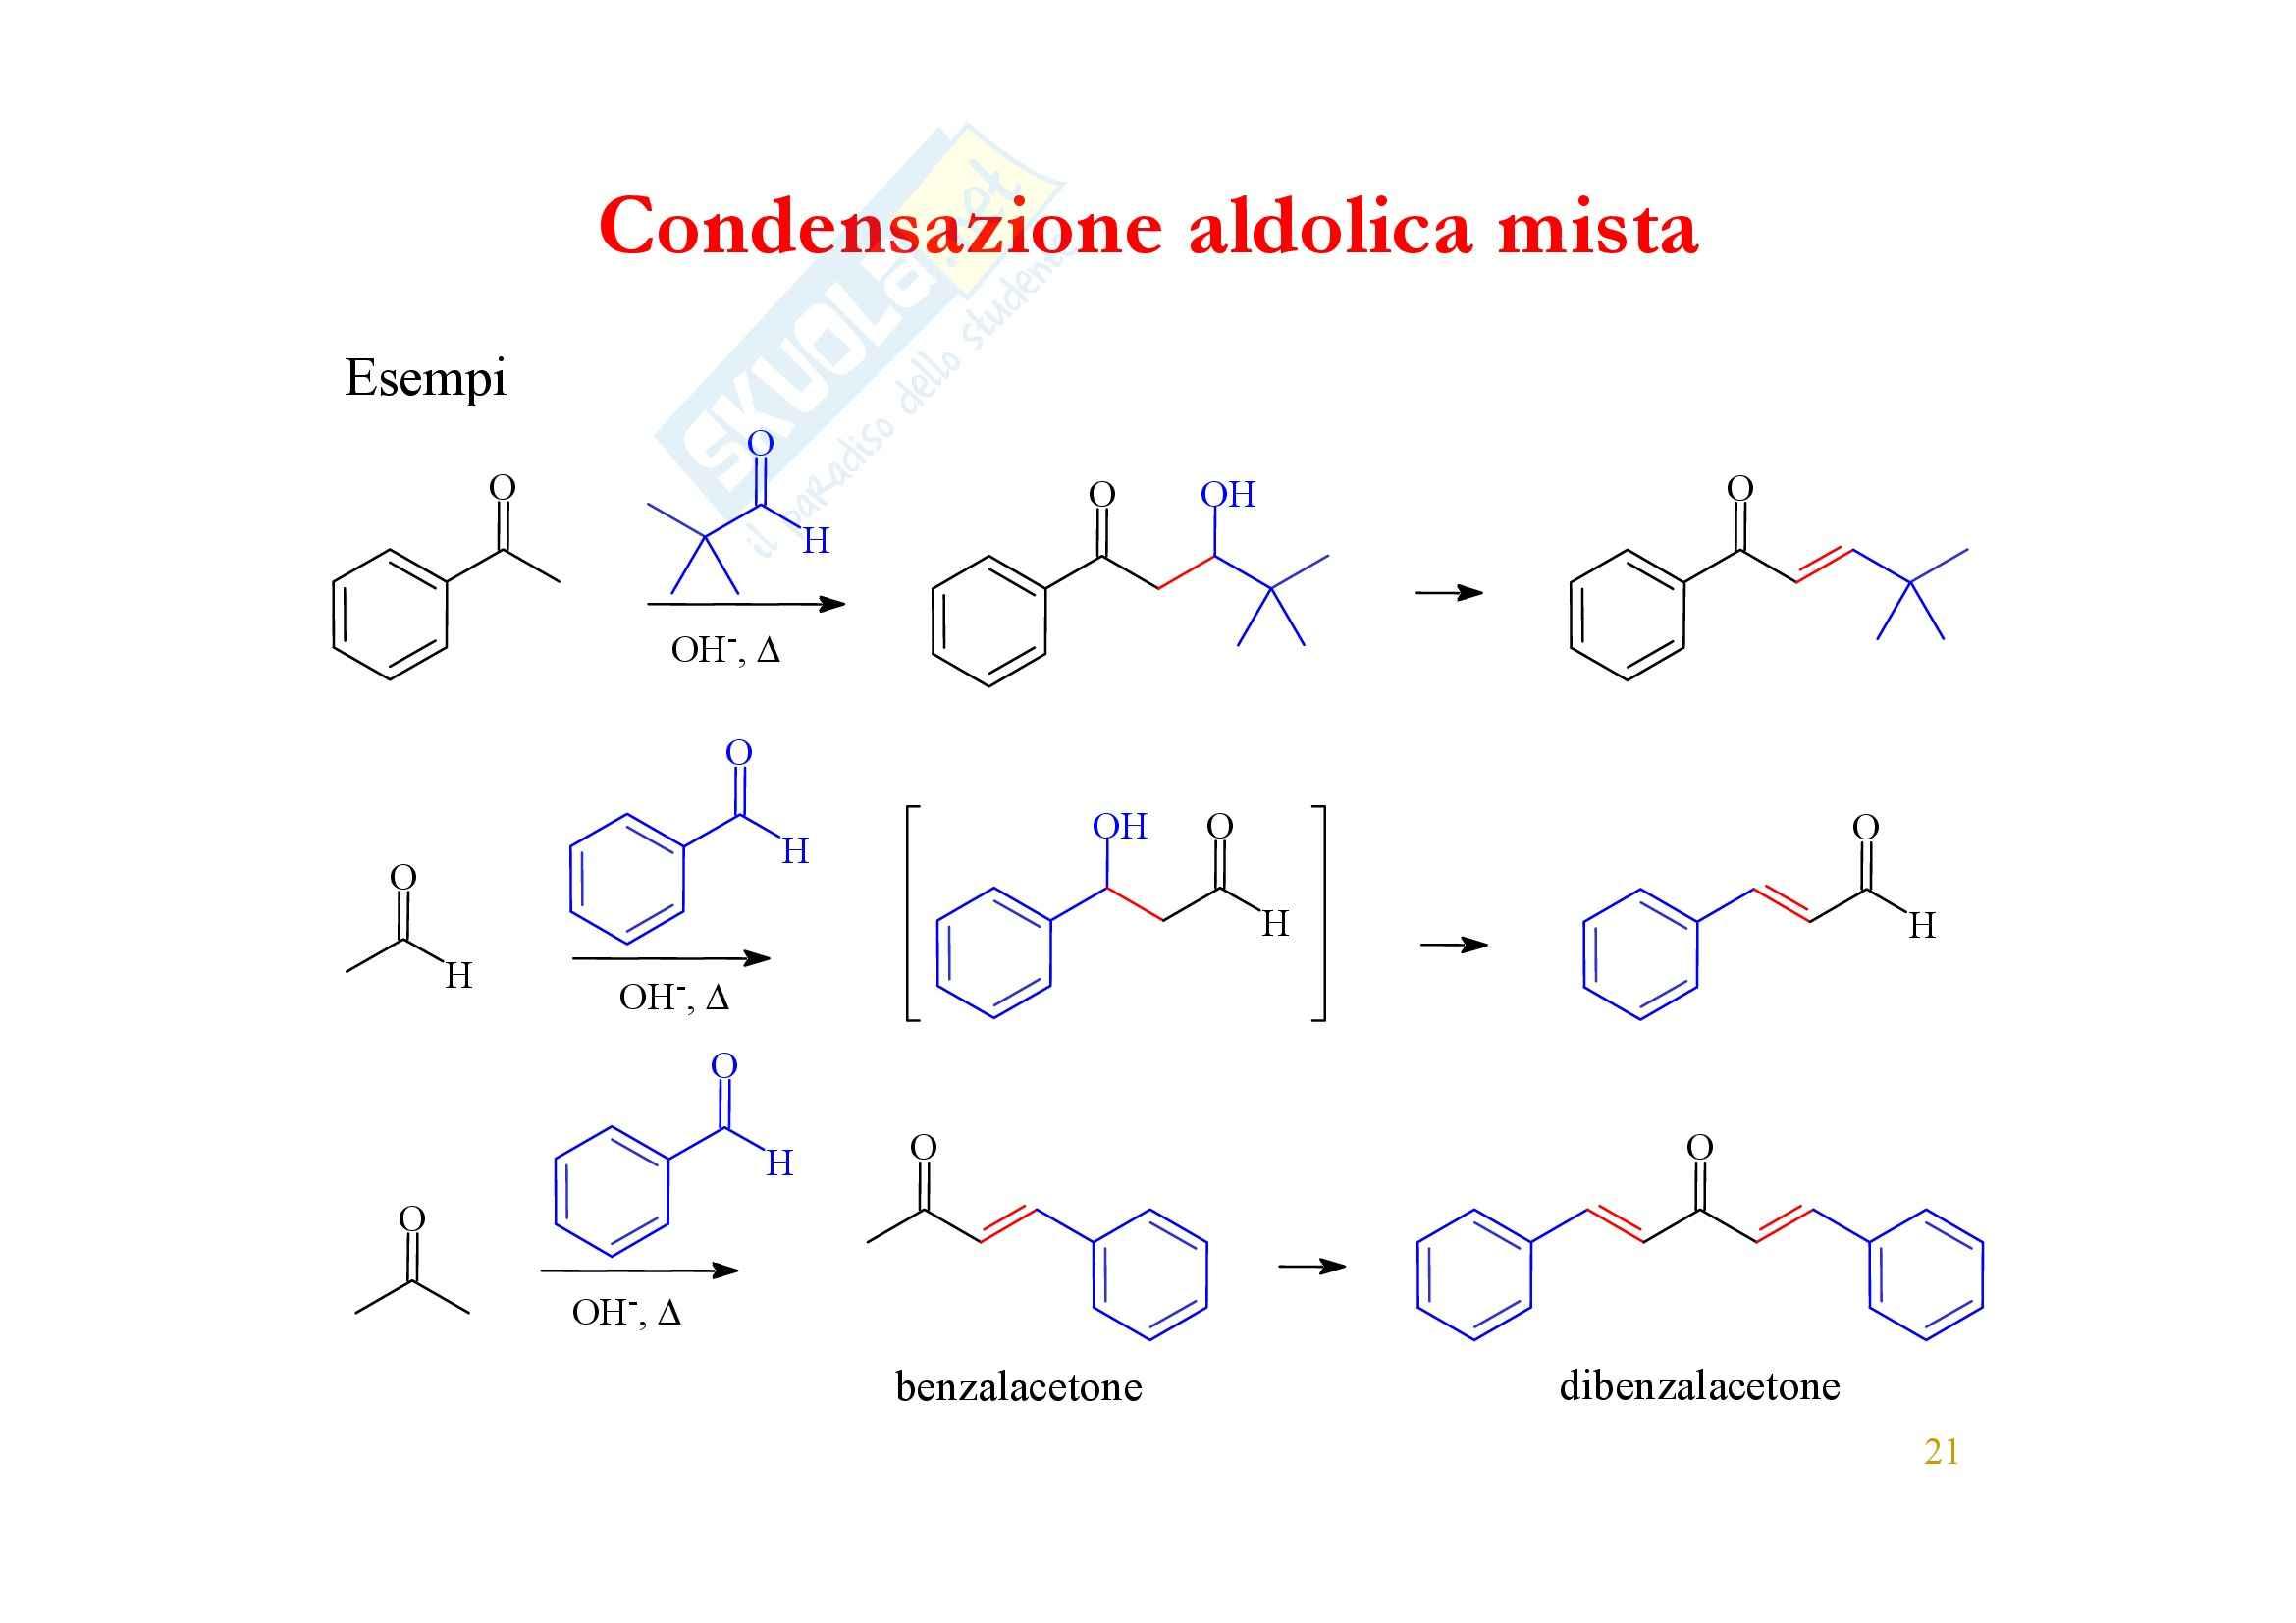 Chimica organica - enoli ed enolati Pag. 21